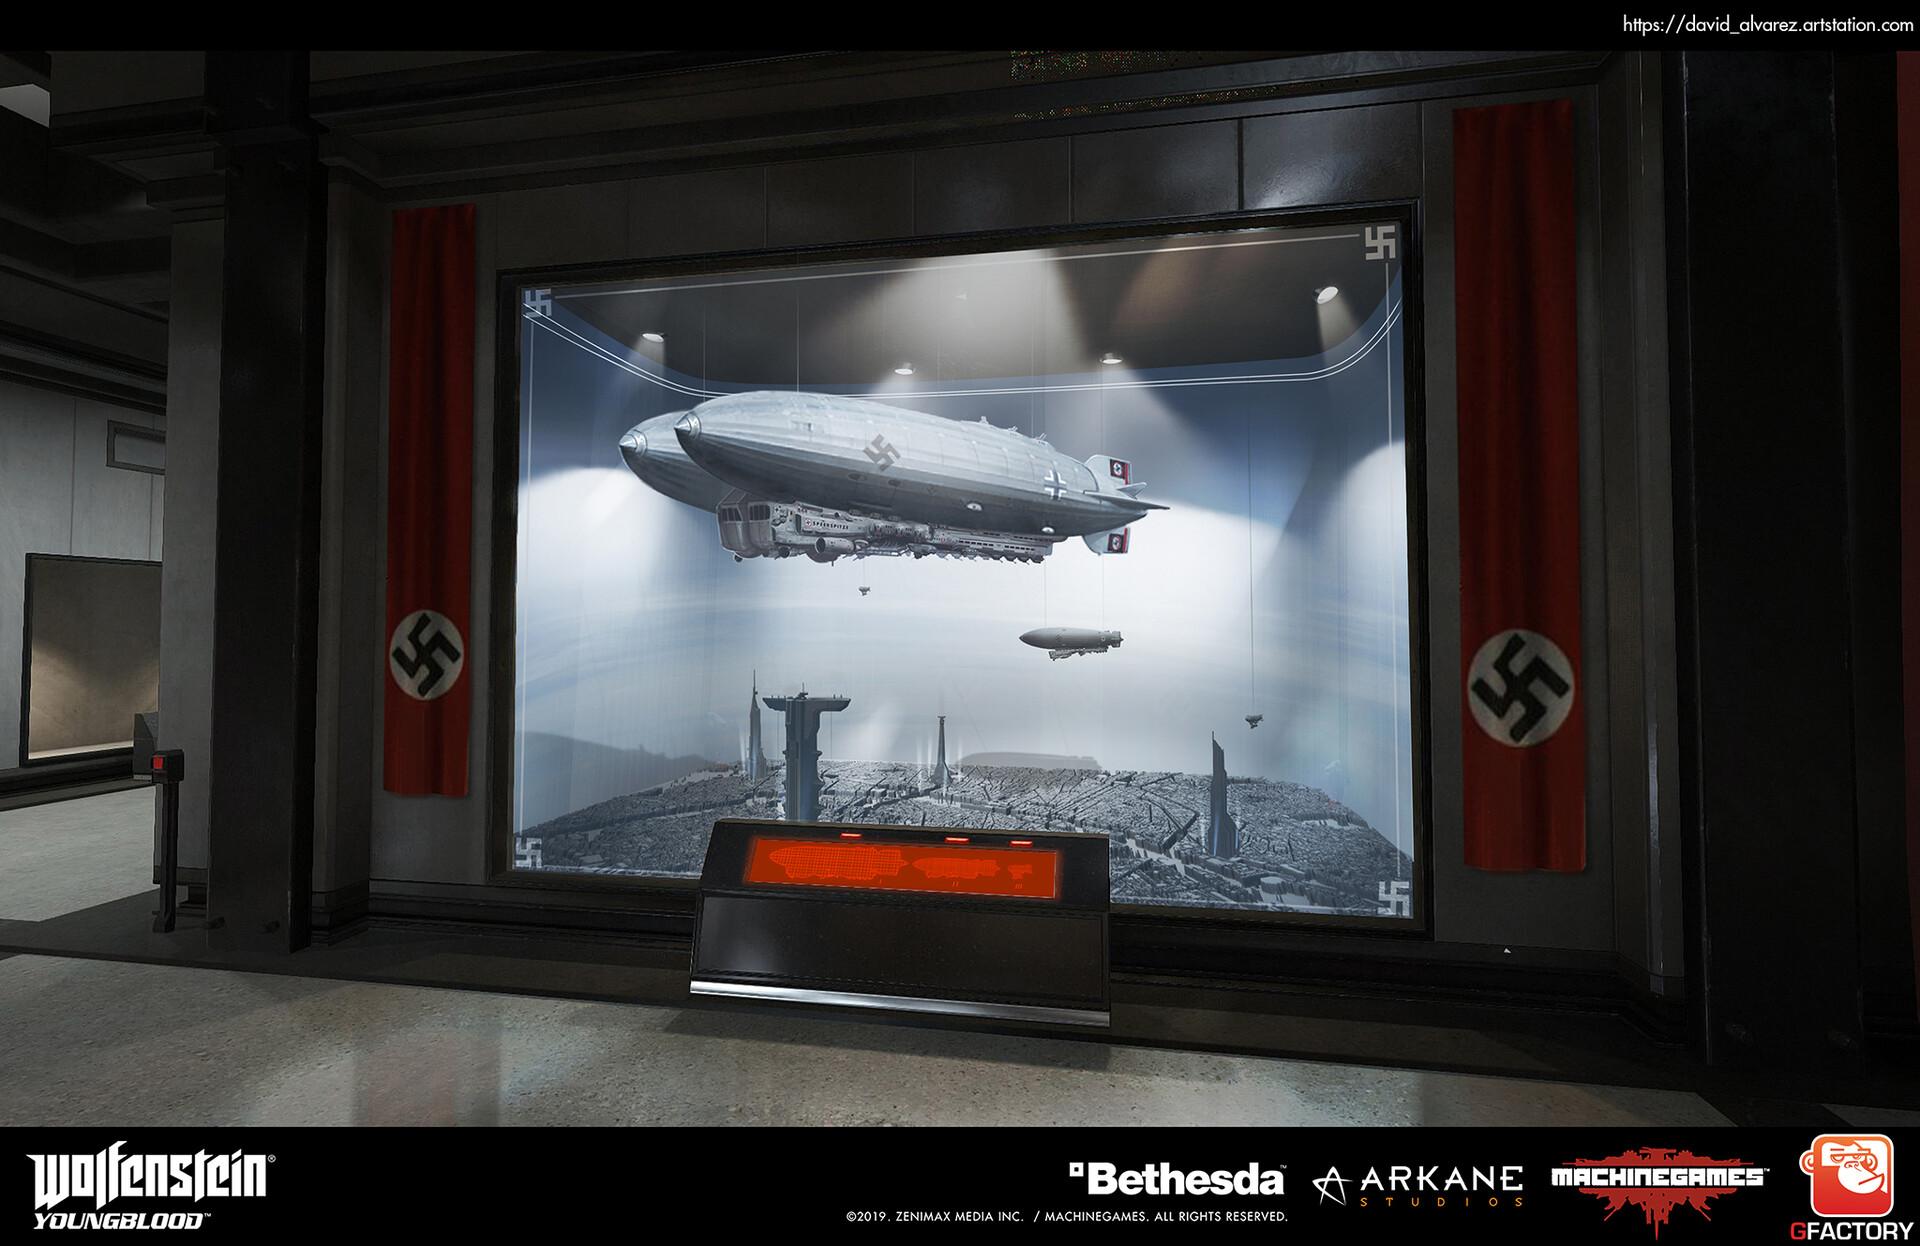 David alvarez dalvarez gf mg yb diorama zeppelins